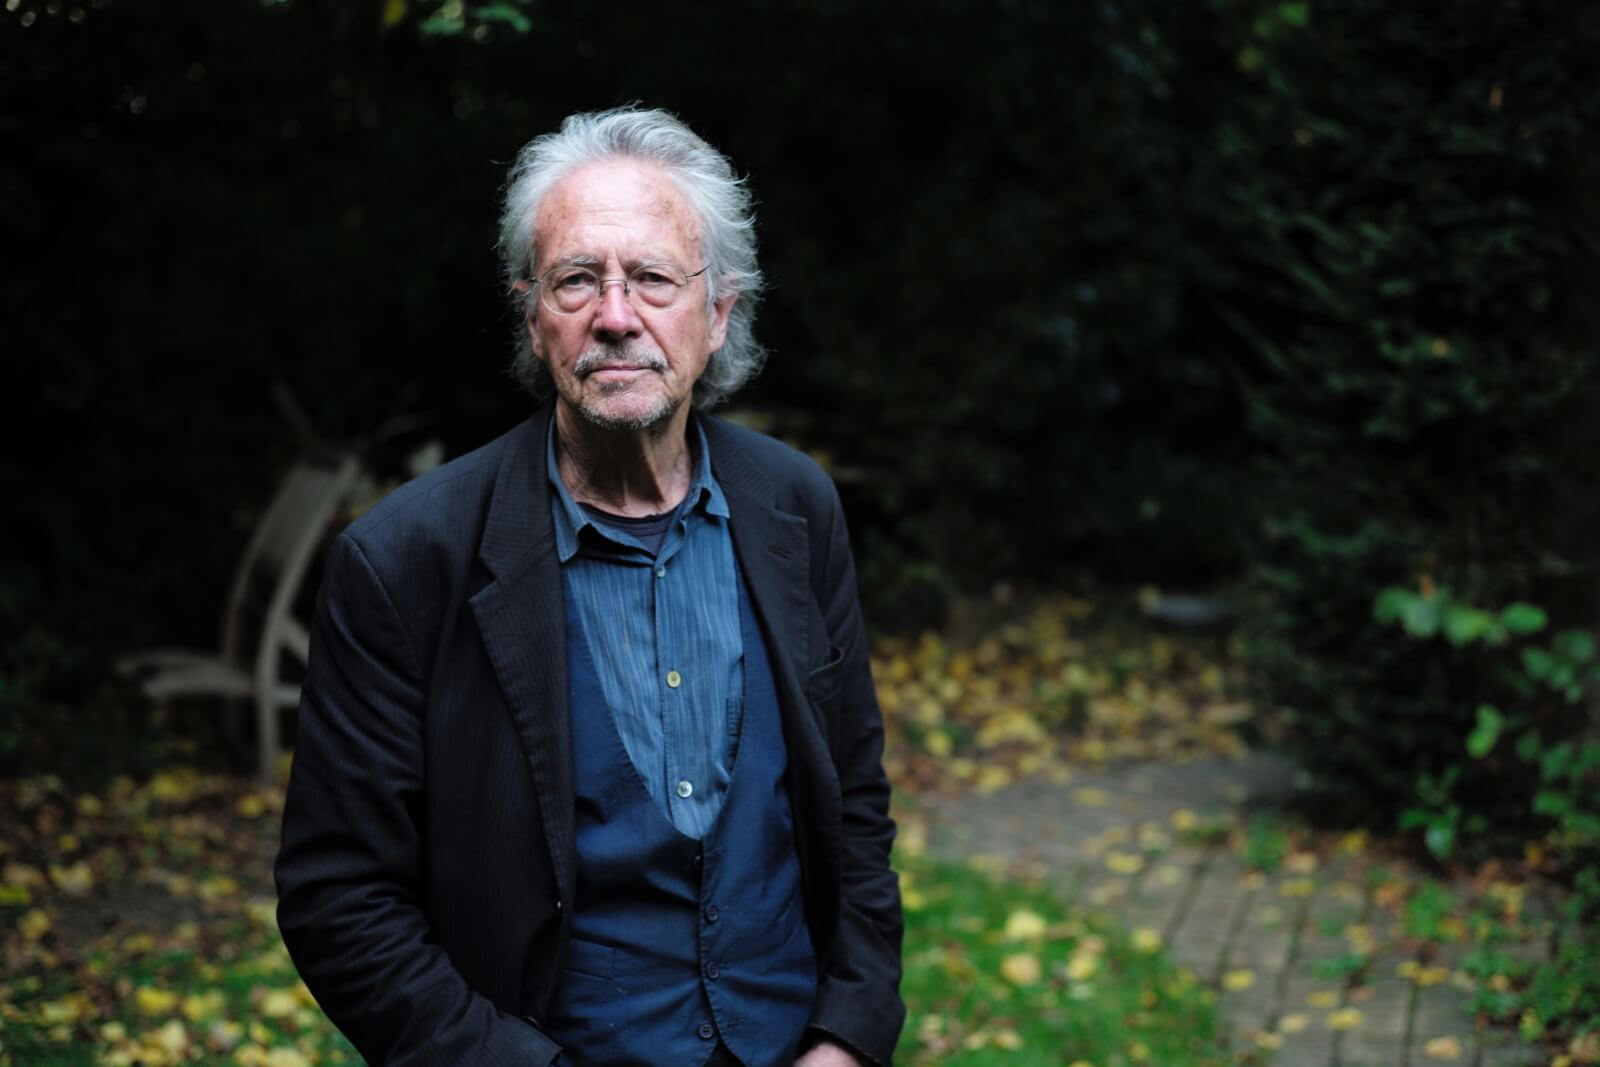 Peter Handke laureatem literackiego Nobla 2019 fot. EPA/JULIEN DE ROSA